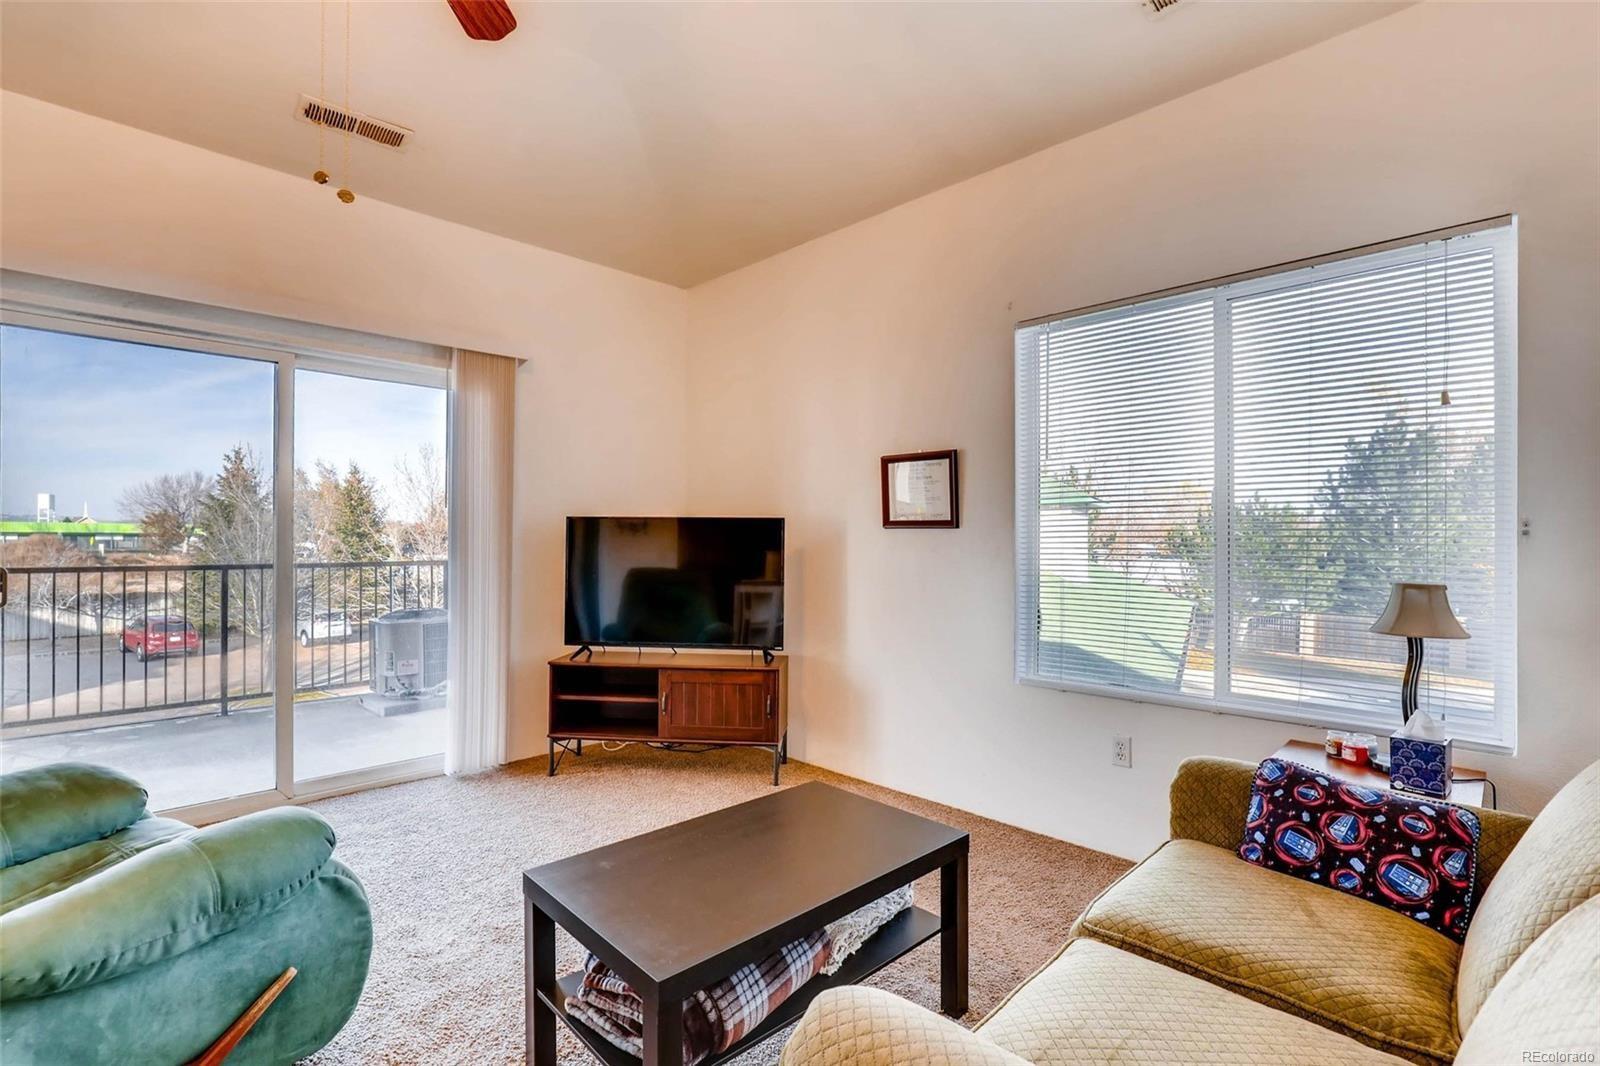 MLS# 9808696 - 12 - 2049 Legacy Ridge View, Colorado Springs, CO 80910